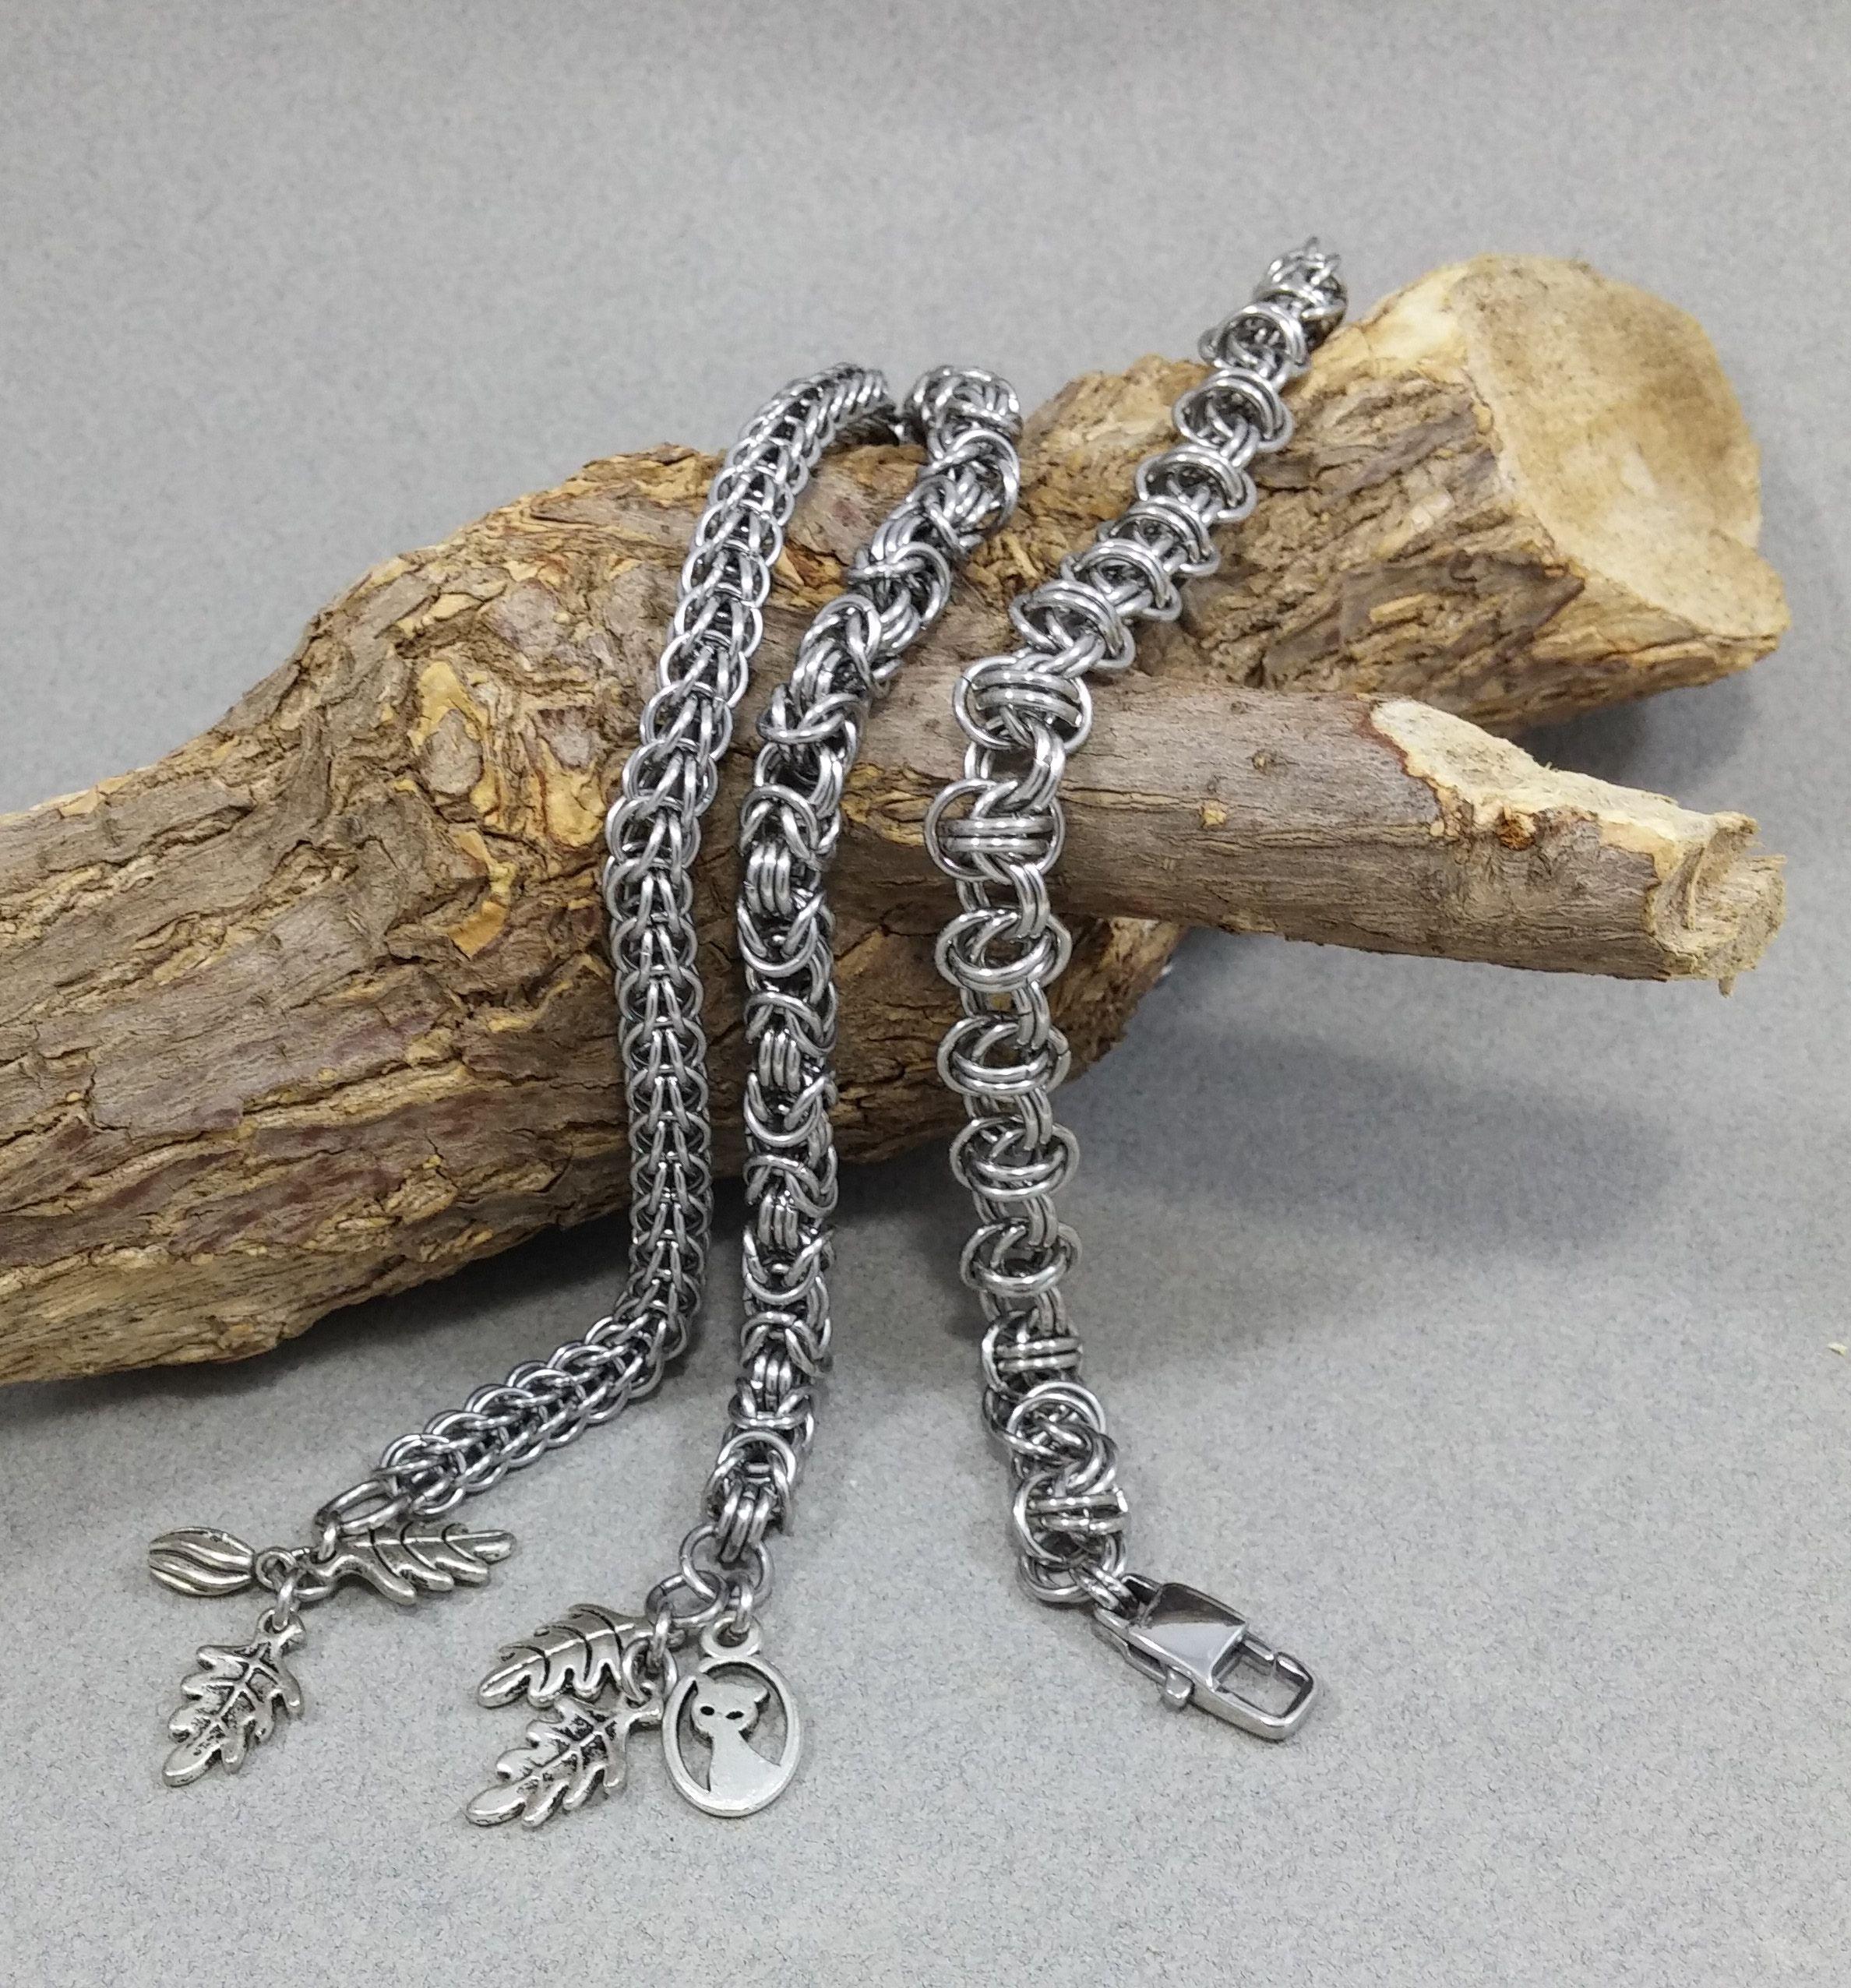 jewelry handmade bracelet metal goftforher steeljewelry unisexbracelet unisex gothic hypoallergenic